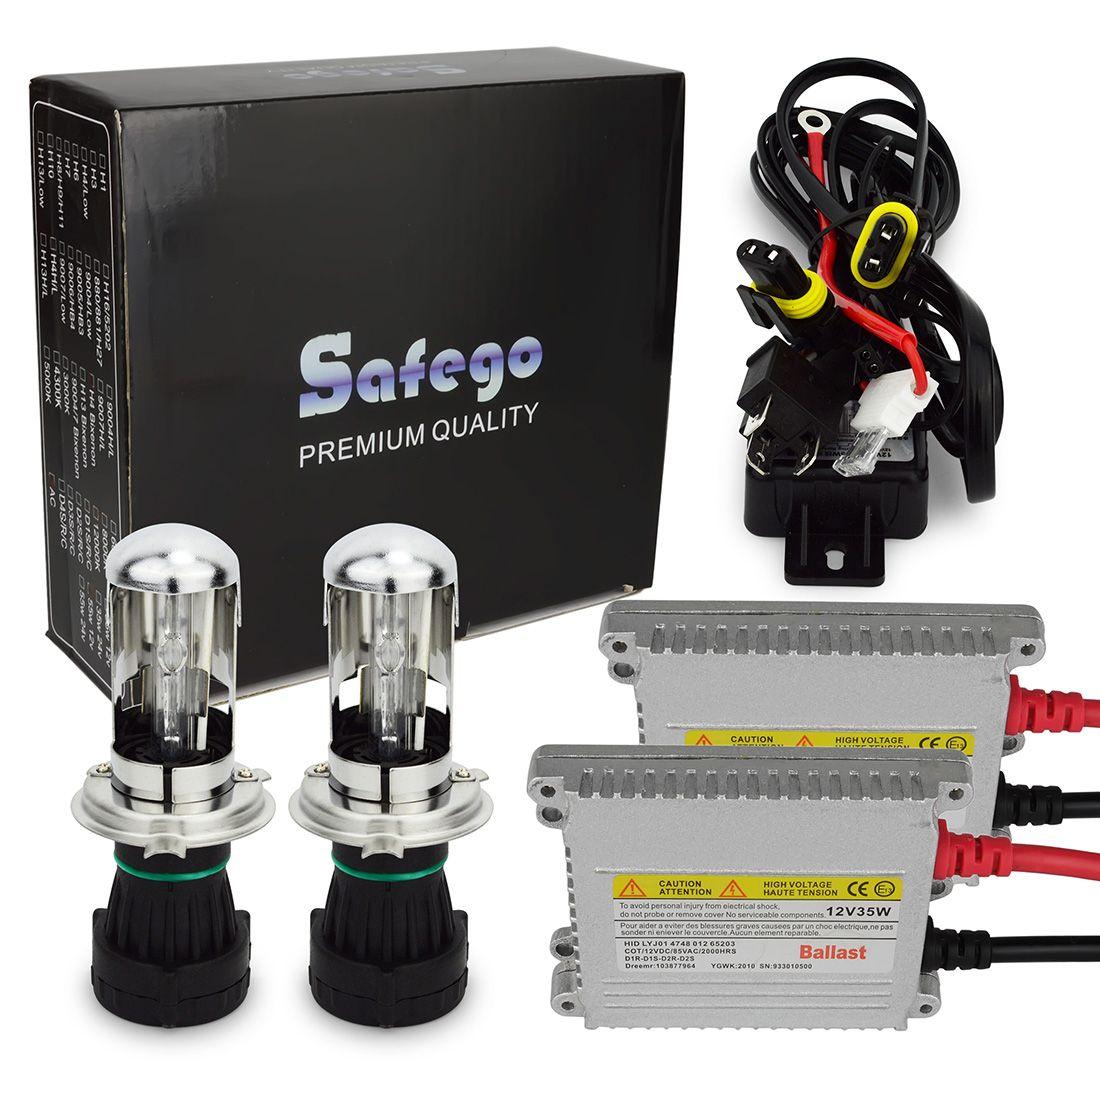 xenon wiring diagram wiring diagram automotiveh4 bi xenon hid wiring diagram ford probe data wiring diagram updatedc 35w h4 bi xenon